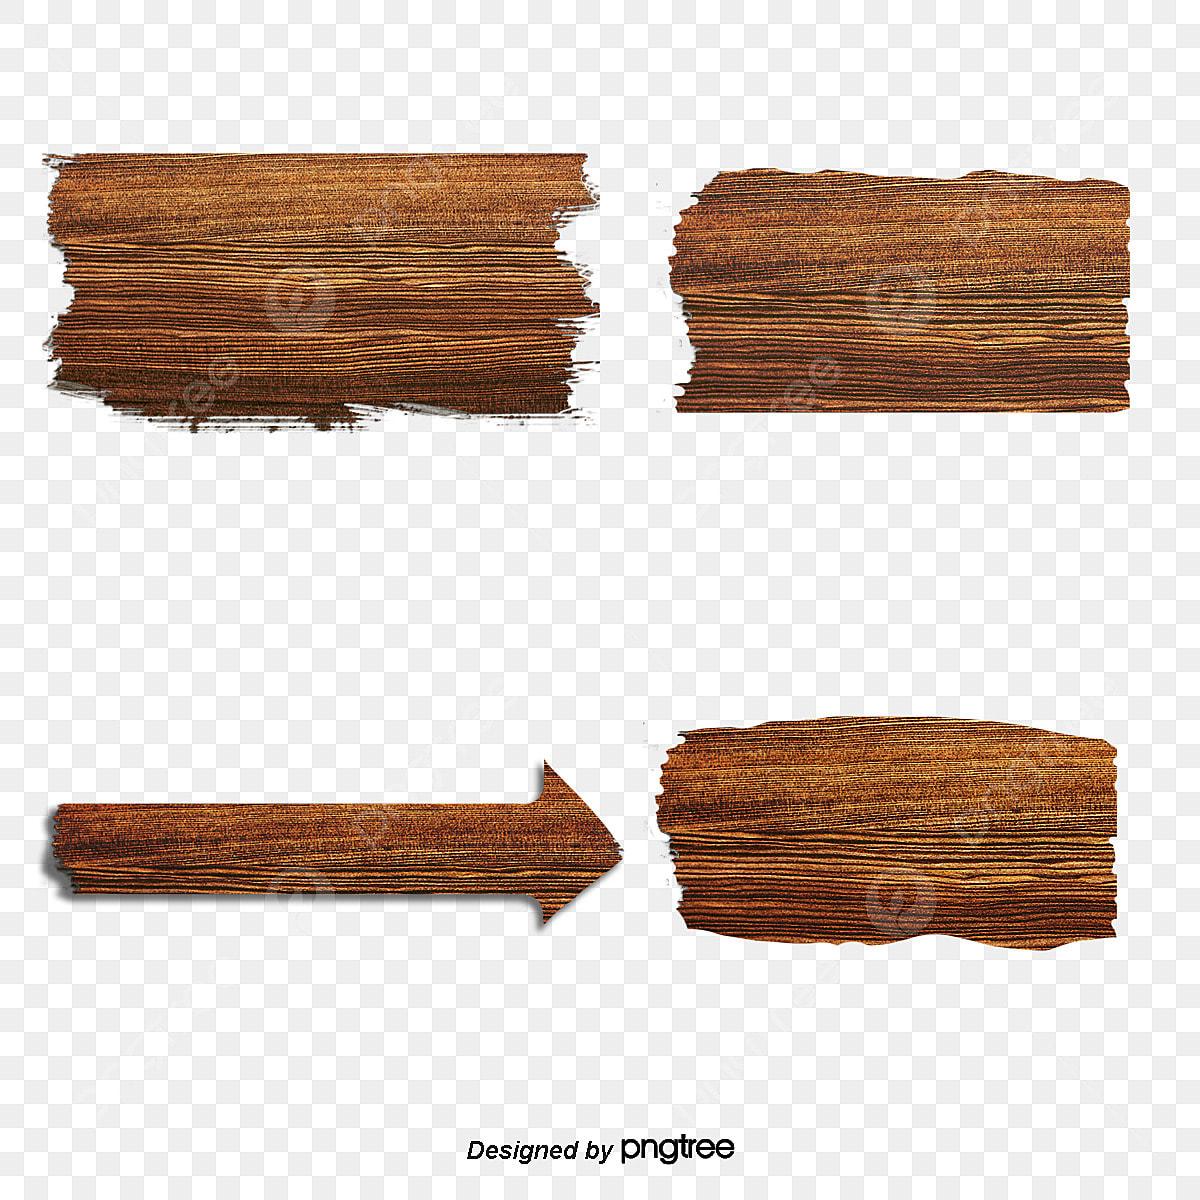 un dessin anim u00e9 mignon r u00e9tro wood  u00c9tiquette titre bar